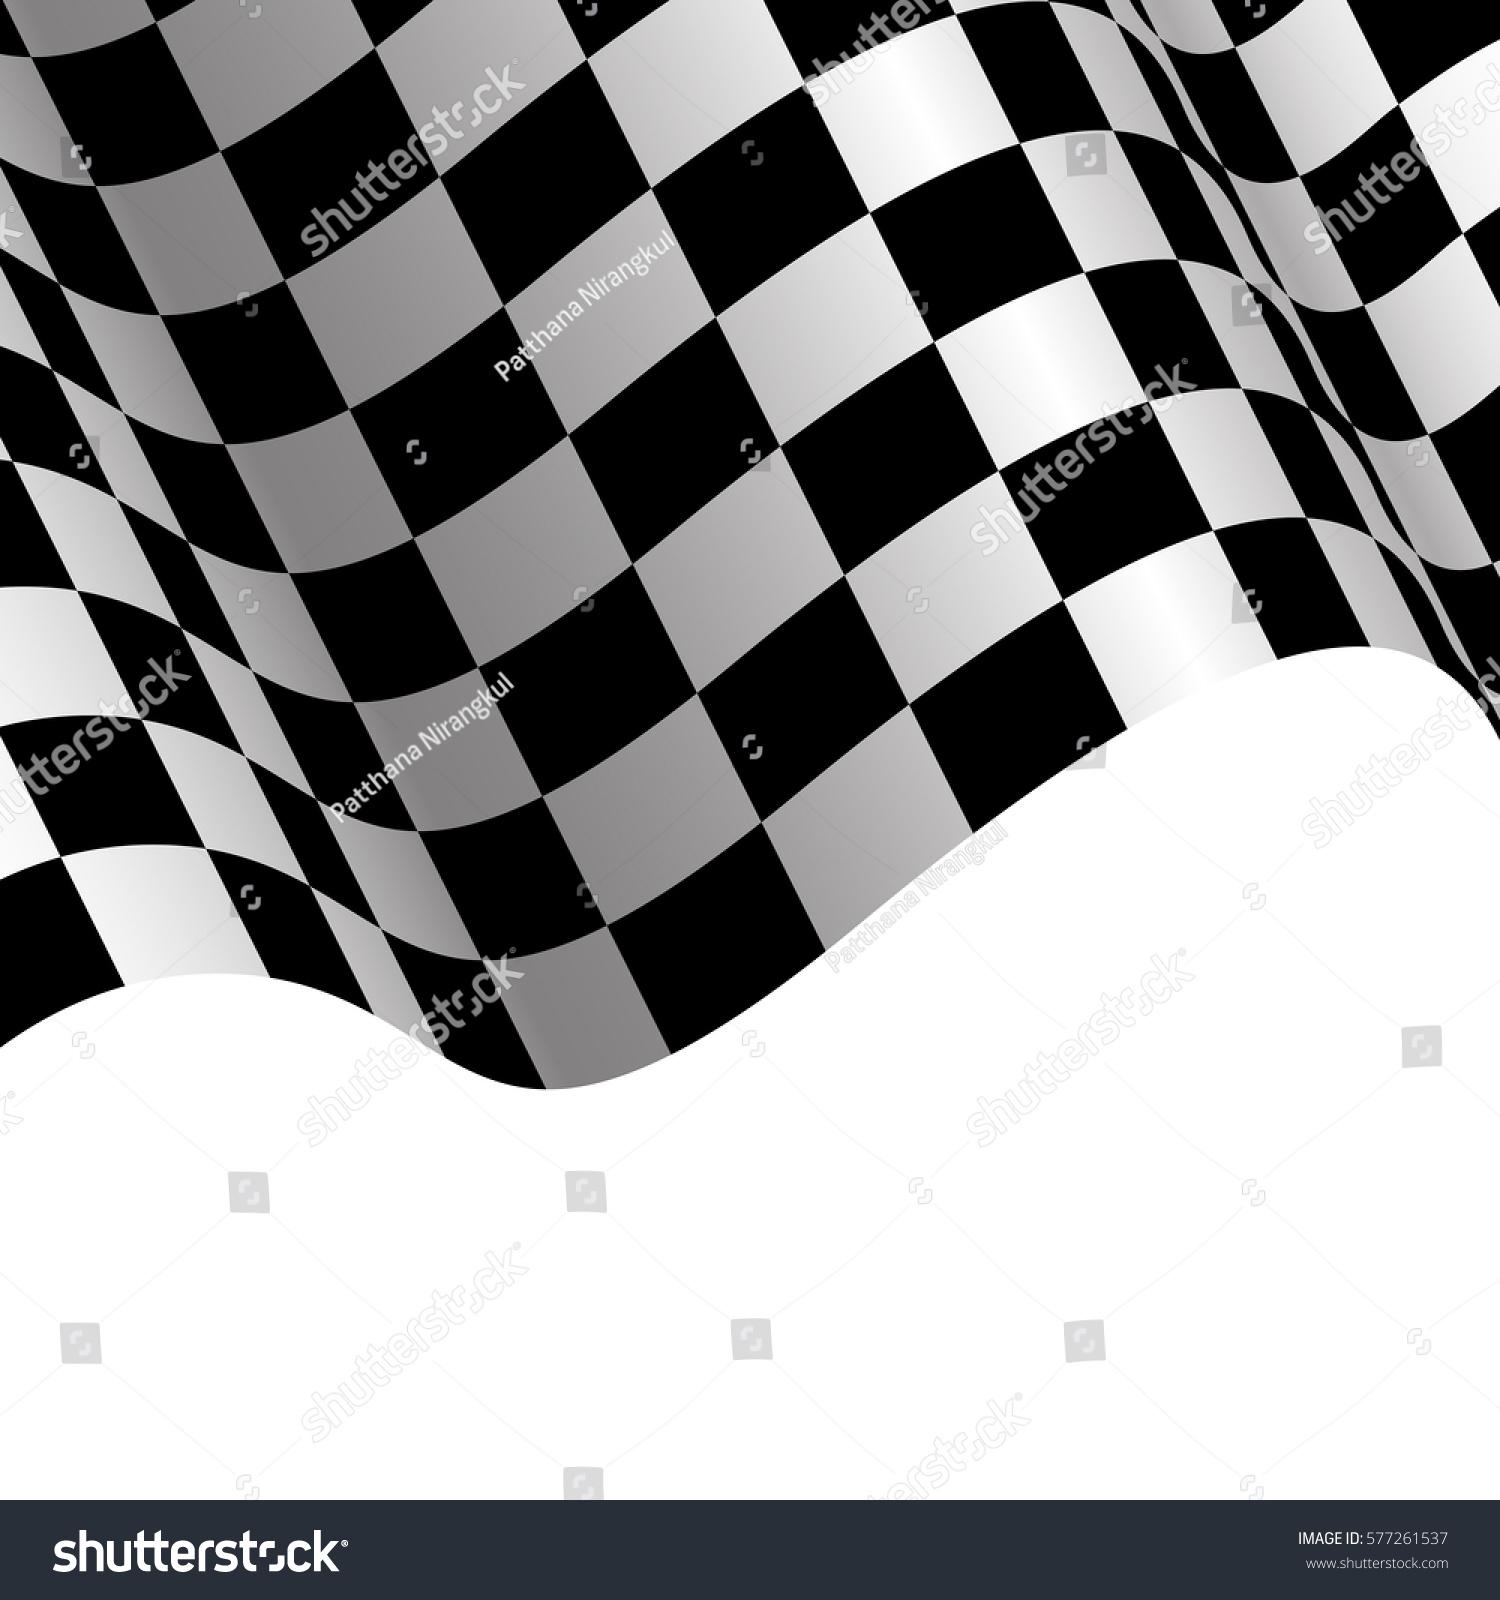 Checkered Design Checkered Flag White Background Design Race Stock Vector 577261537